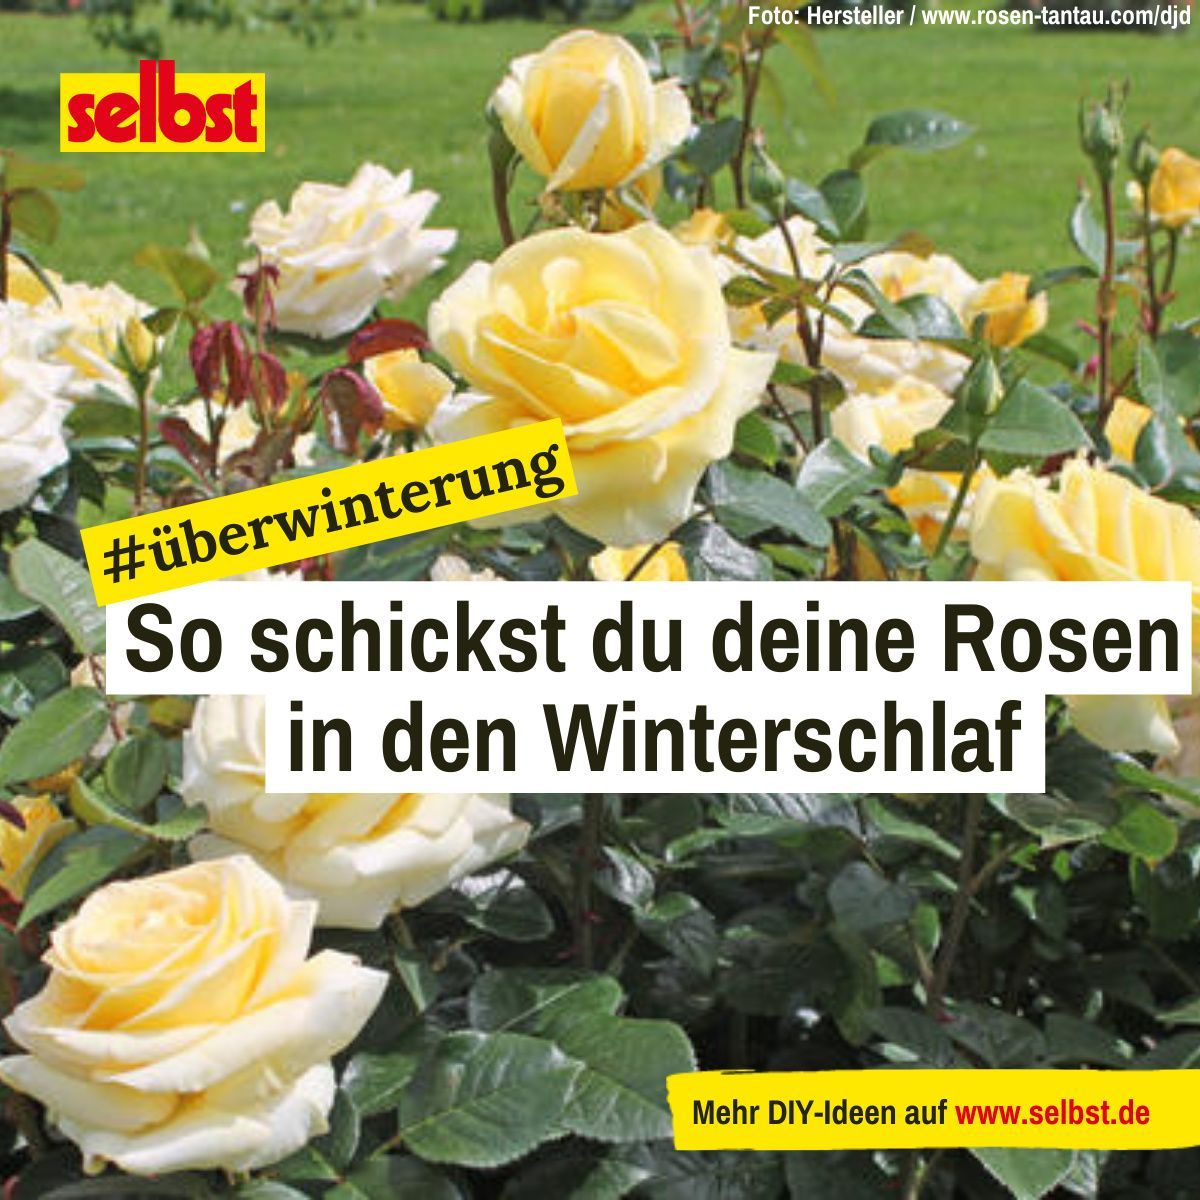 Rosen Uberwintern Selbst De Rosen Uberwintern Rosen Pflanzen Pflanzen